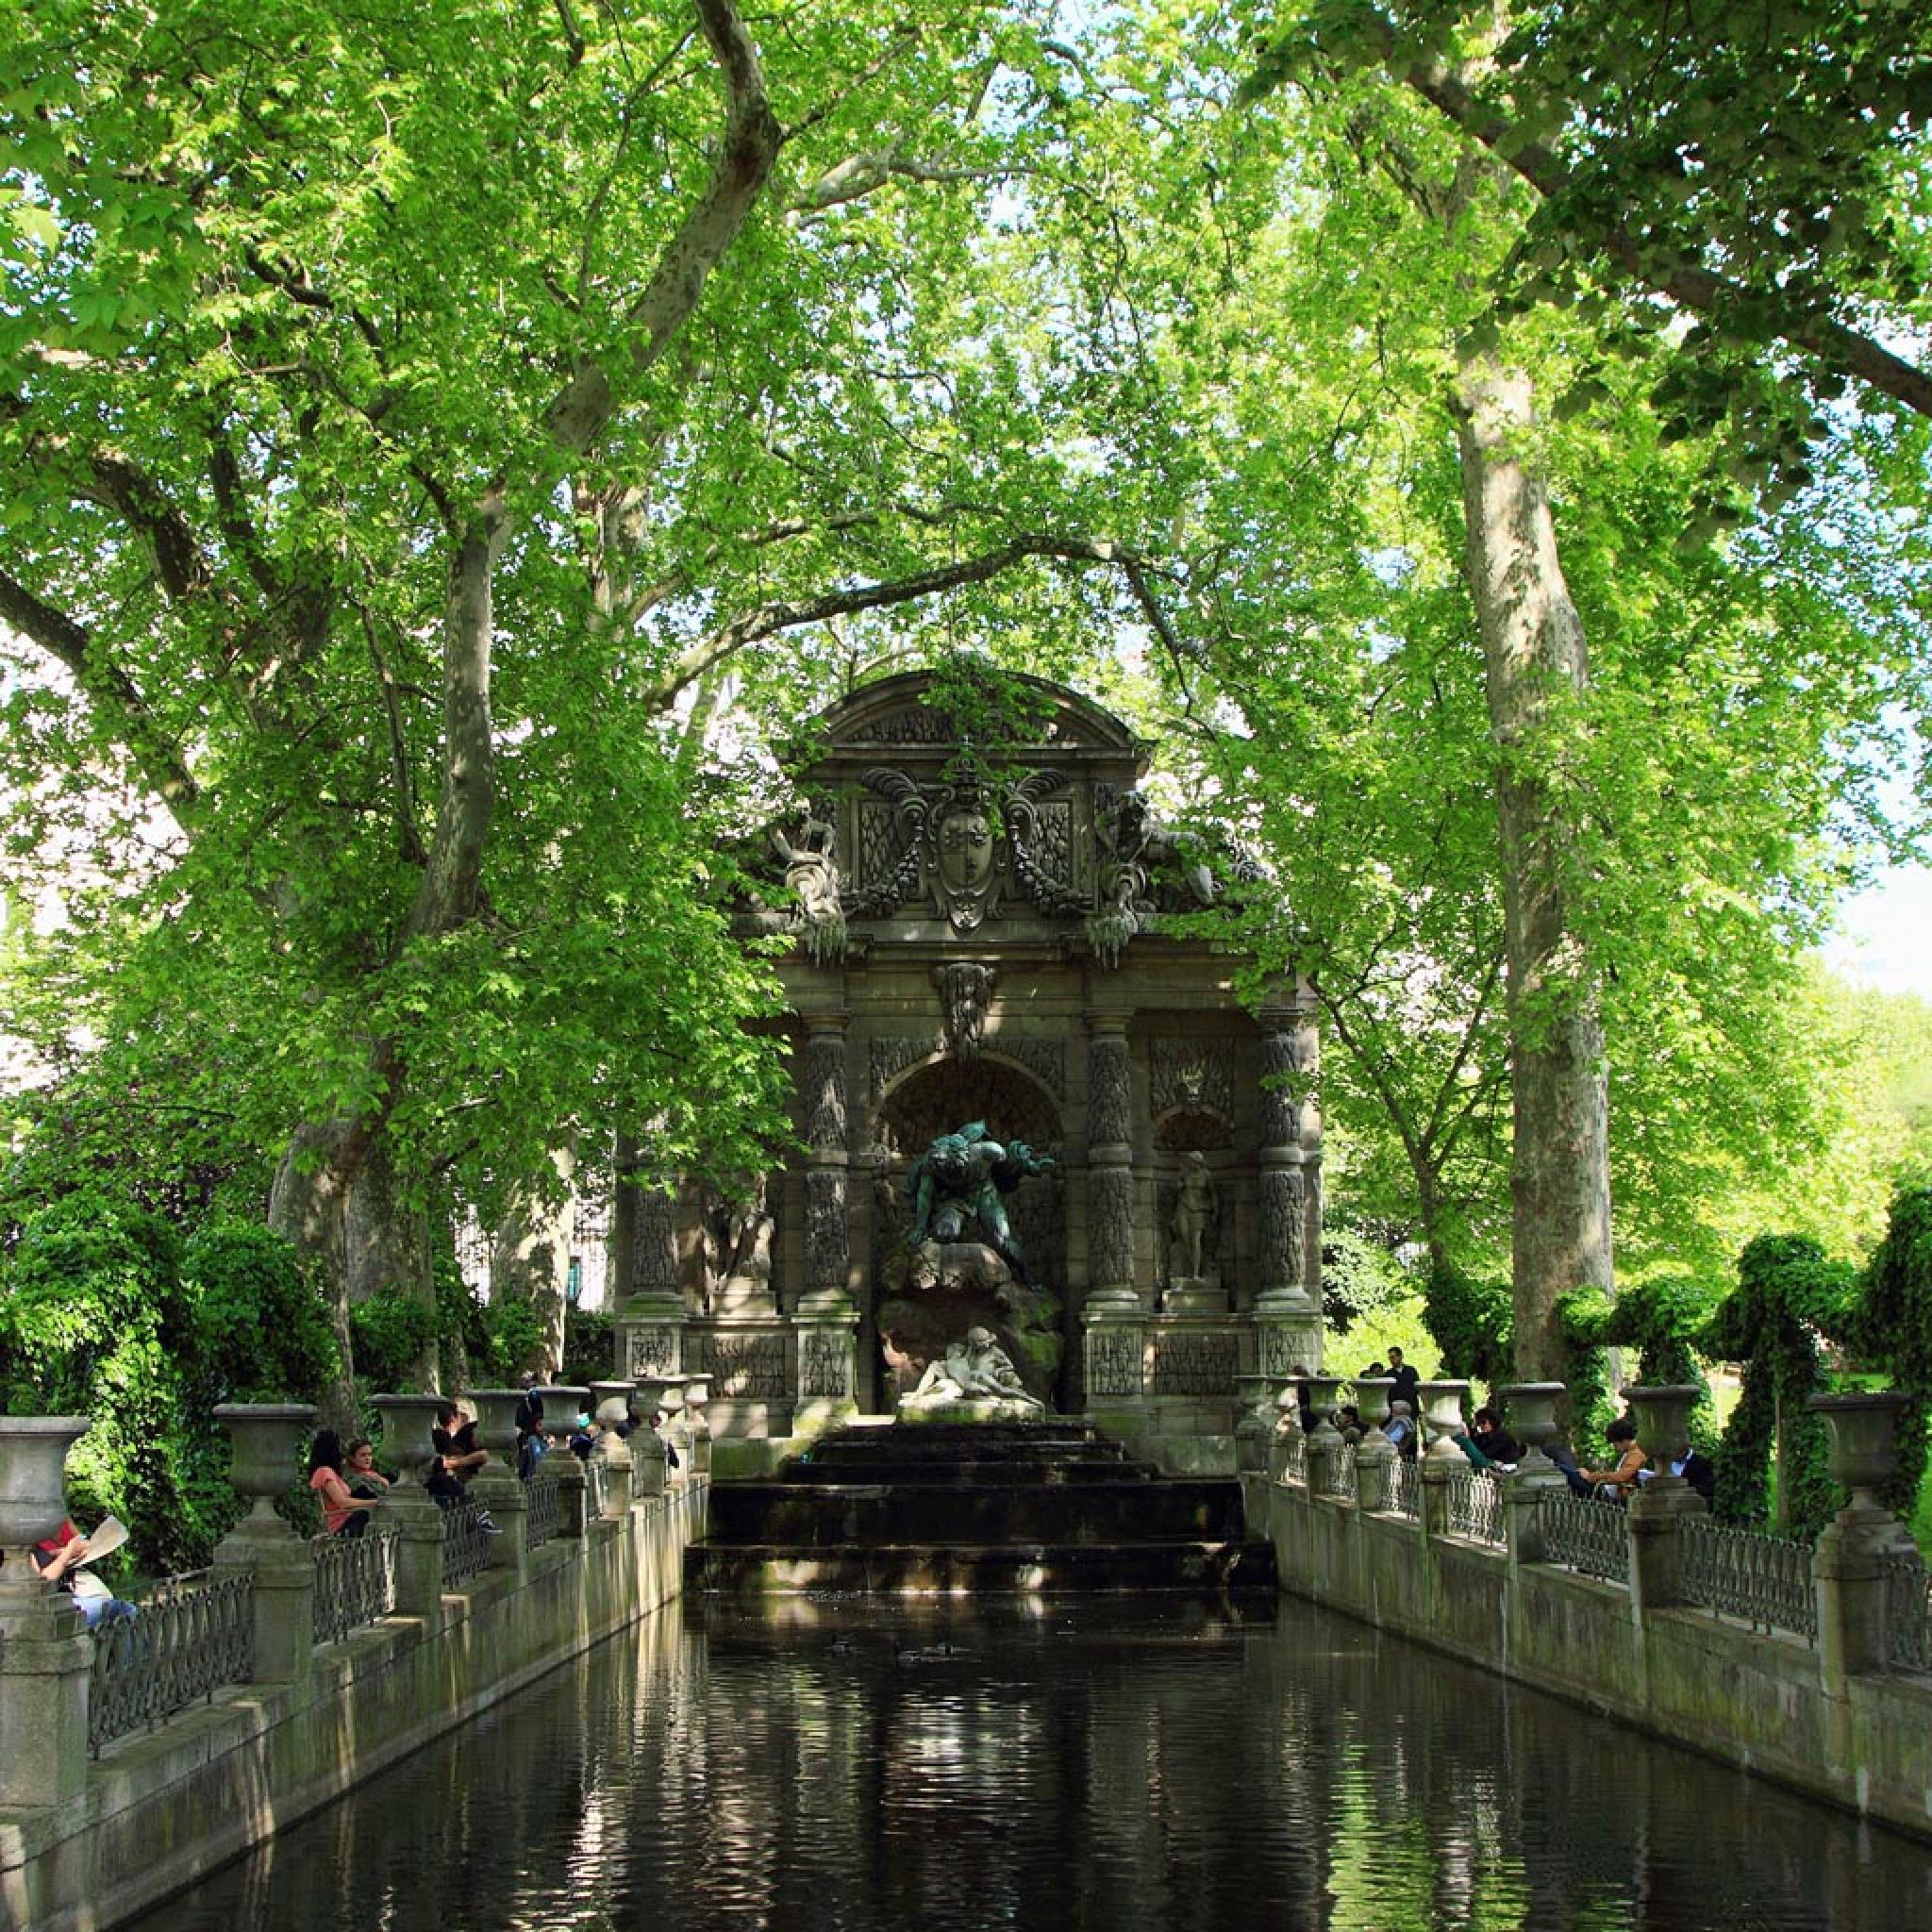 X Japan Wallpaper Hd Landmarks Luxembourg Gardens In Paris Ipad Iphone Hd